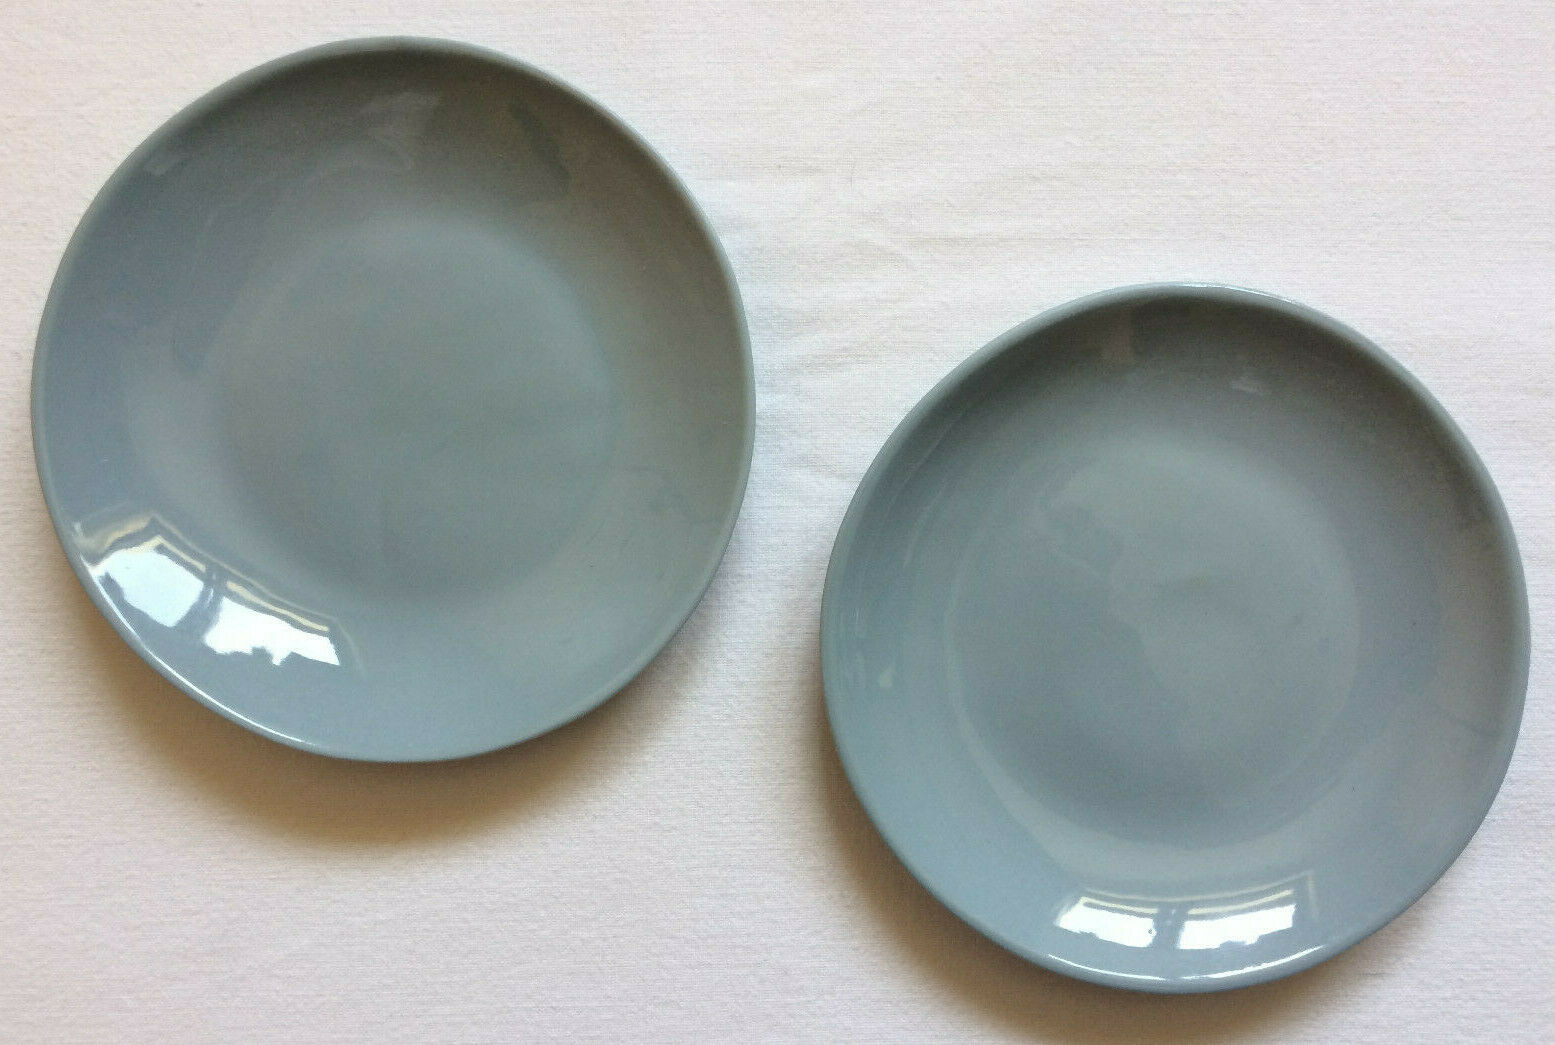 2x ALiCE Plate mini blaugrau ++ Sandra Haischberger feinedinge Teller Untertasse      Sehr gute Farbe